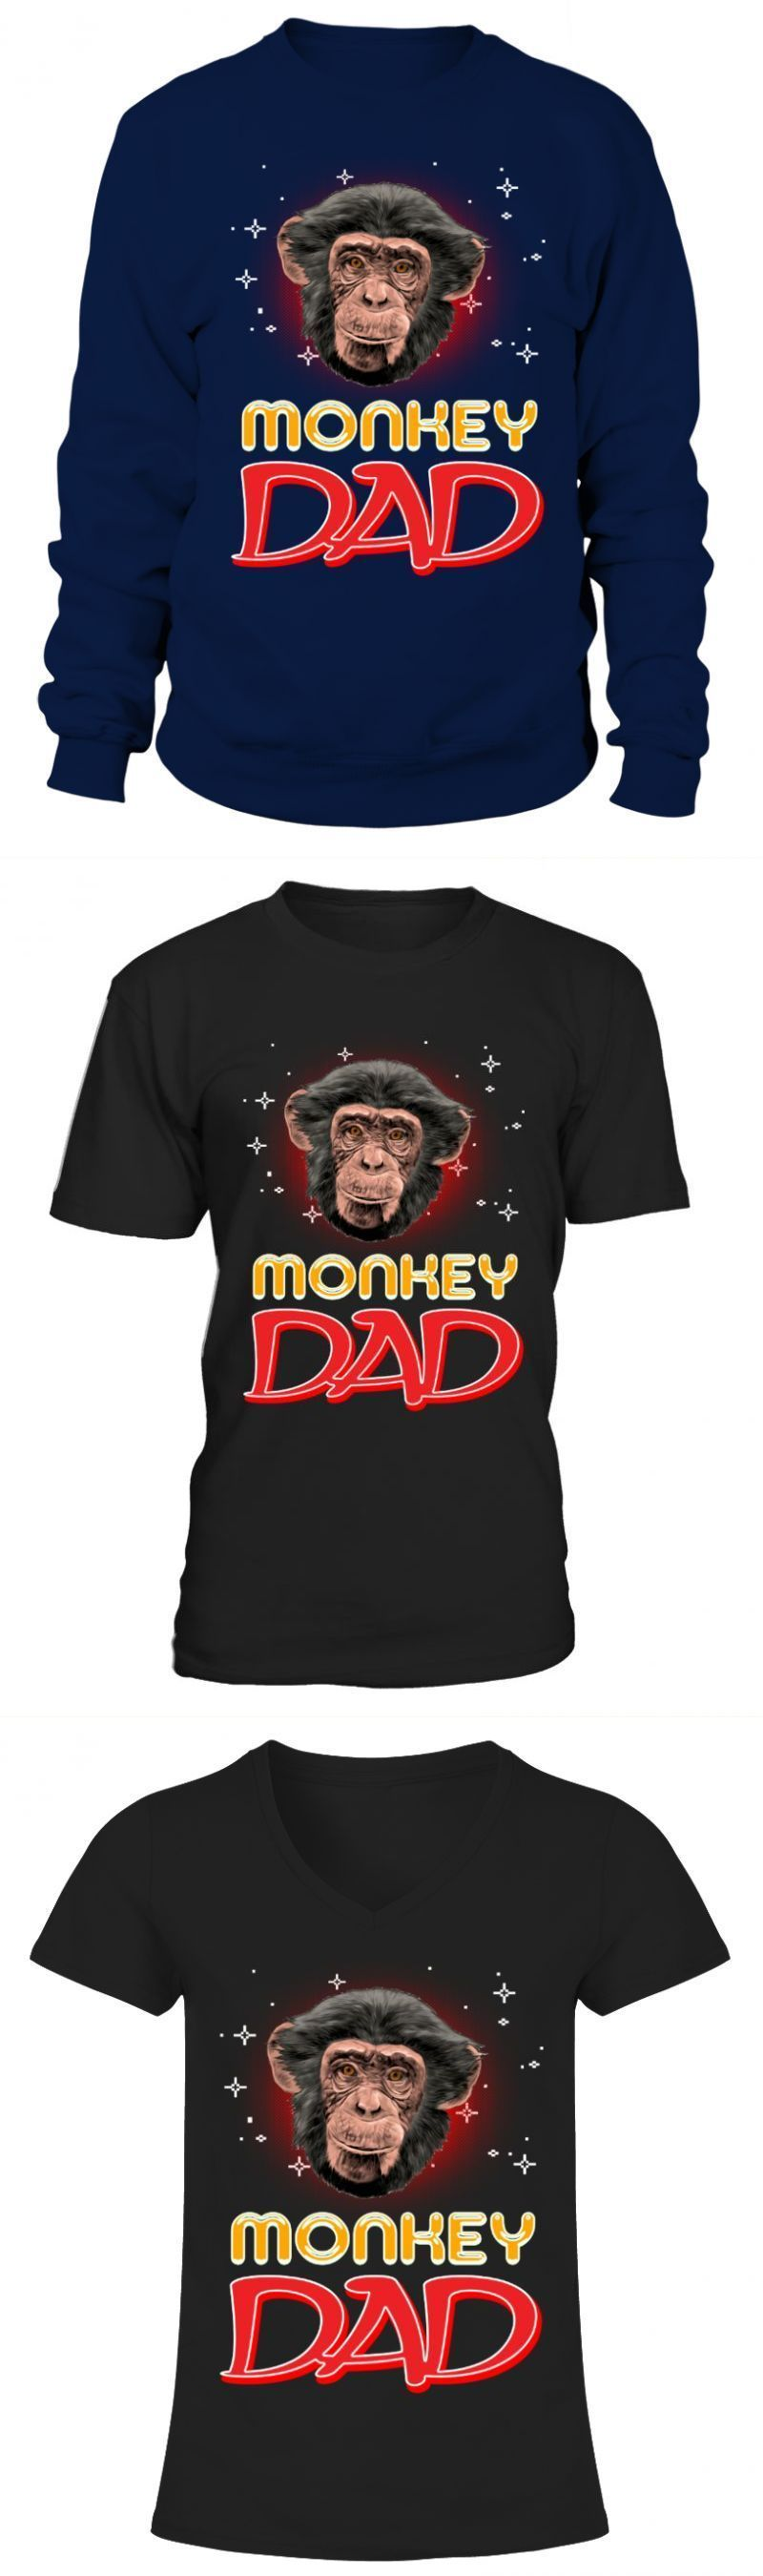 Gas monkey garage t shirt mens monkey dad - papa lover monkey island t shirt #gasmonkeygarage Gas monkey garage t shirt mens monkey dad - papa lover monkey island t shirt #gas #monkey #garage #shirt #mens #dad #papa #lover #island #arctic #monkeys #womens #sweatshirt #unisex #round #neck #t-shirt #v-neck #woman #gasmonkeygarage